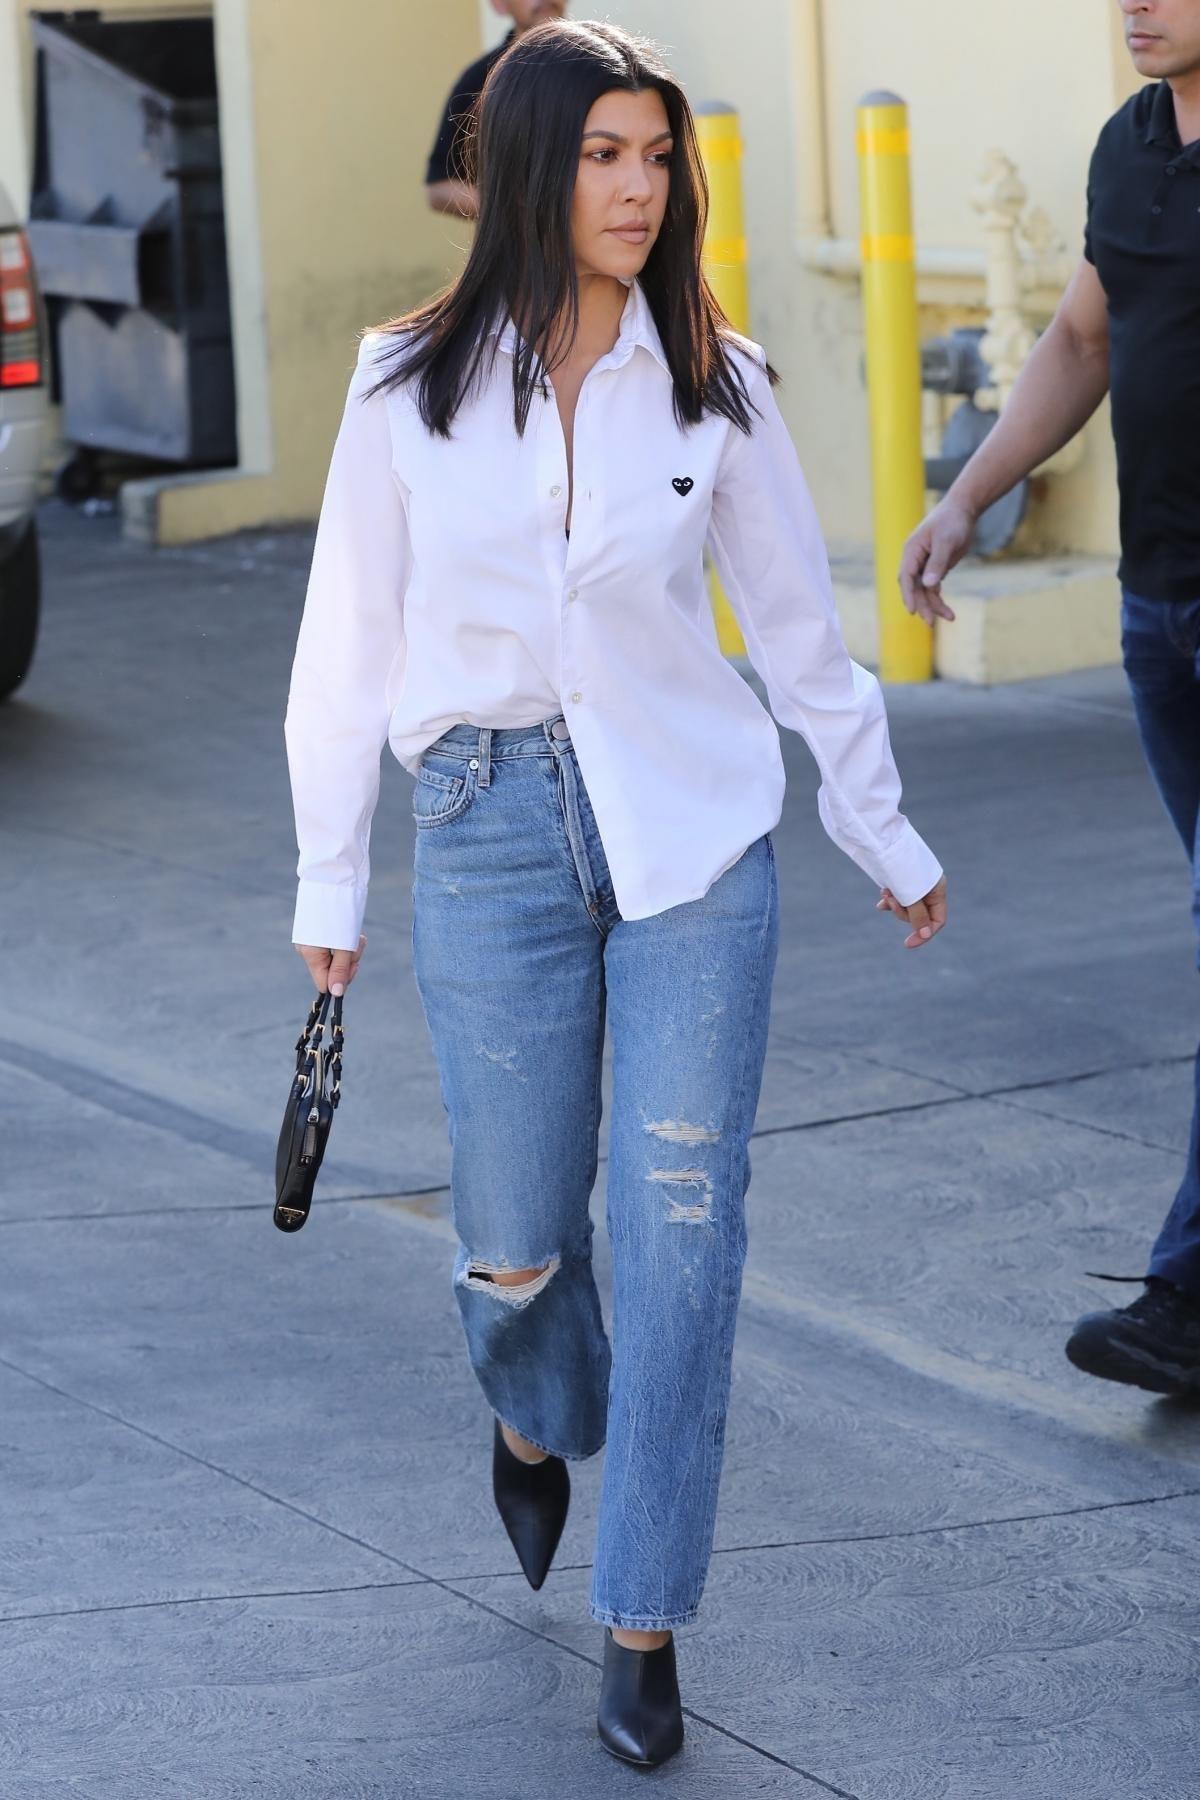 92c5e21b8eeea Kourtney Kardashian leaves Carousel Restaurant dressed in a white Commes  Des Garcons shirt and blue Jean Atelier jeans